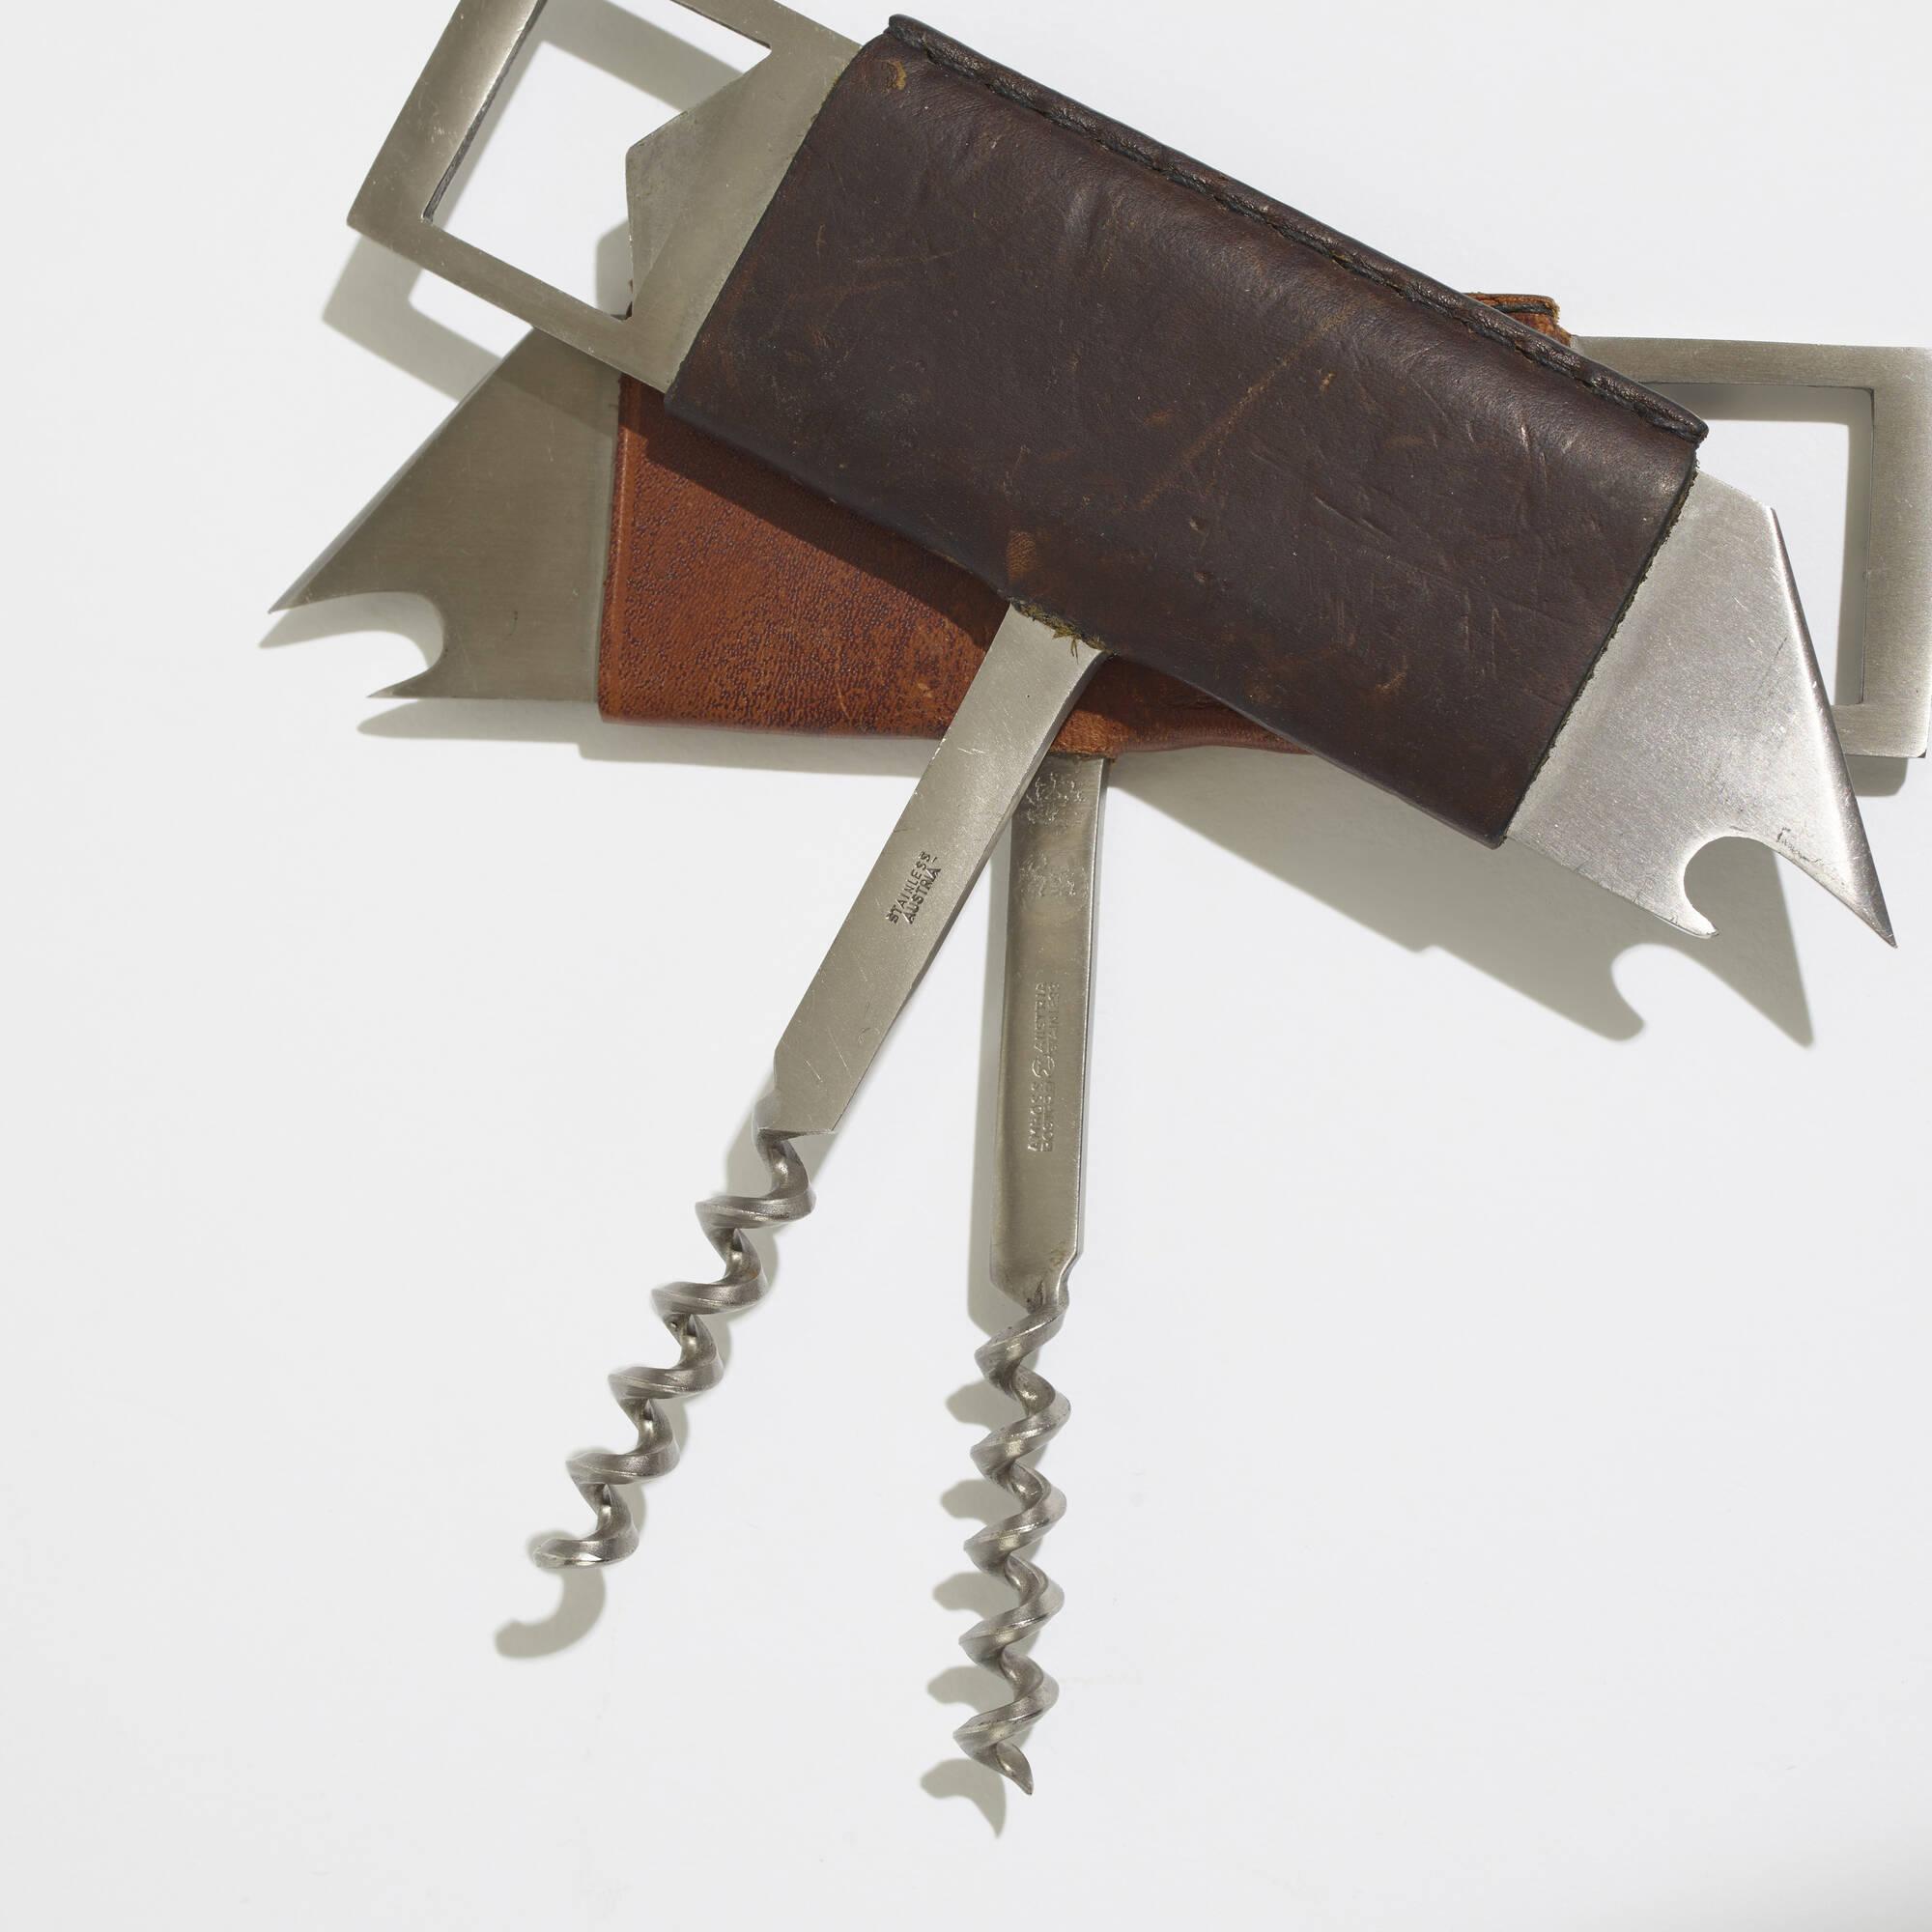 303: Carl Auböck III / corkscrews model 4707, set of four (2 of 2)